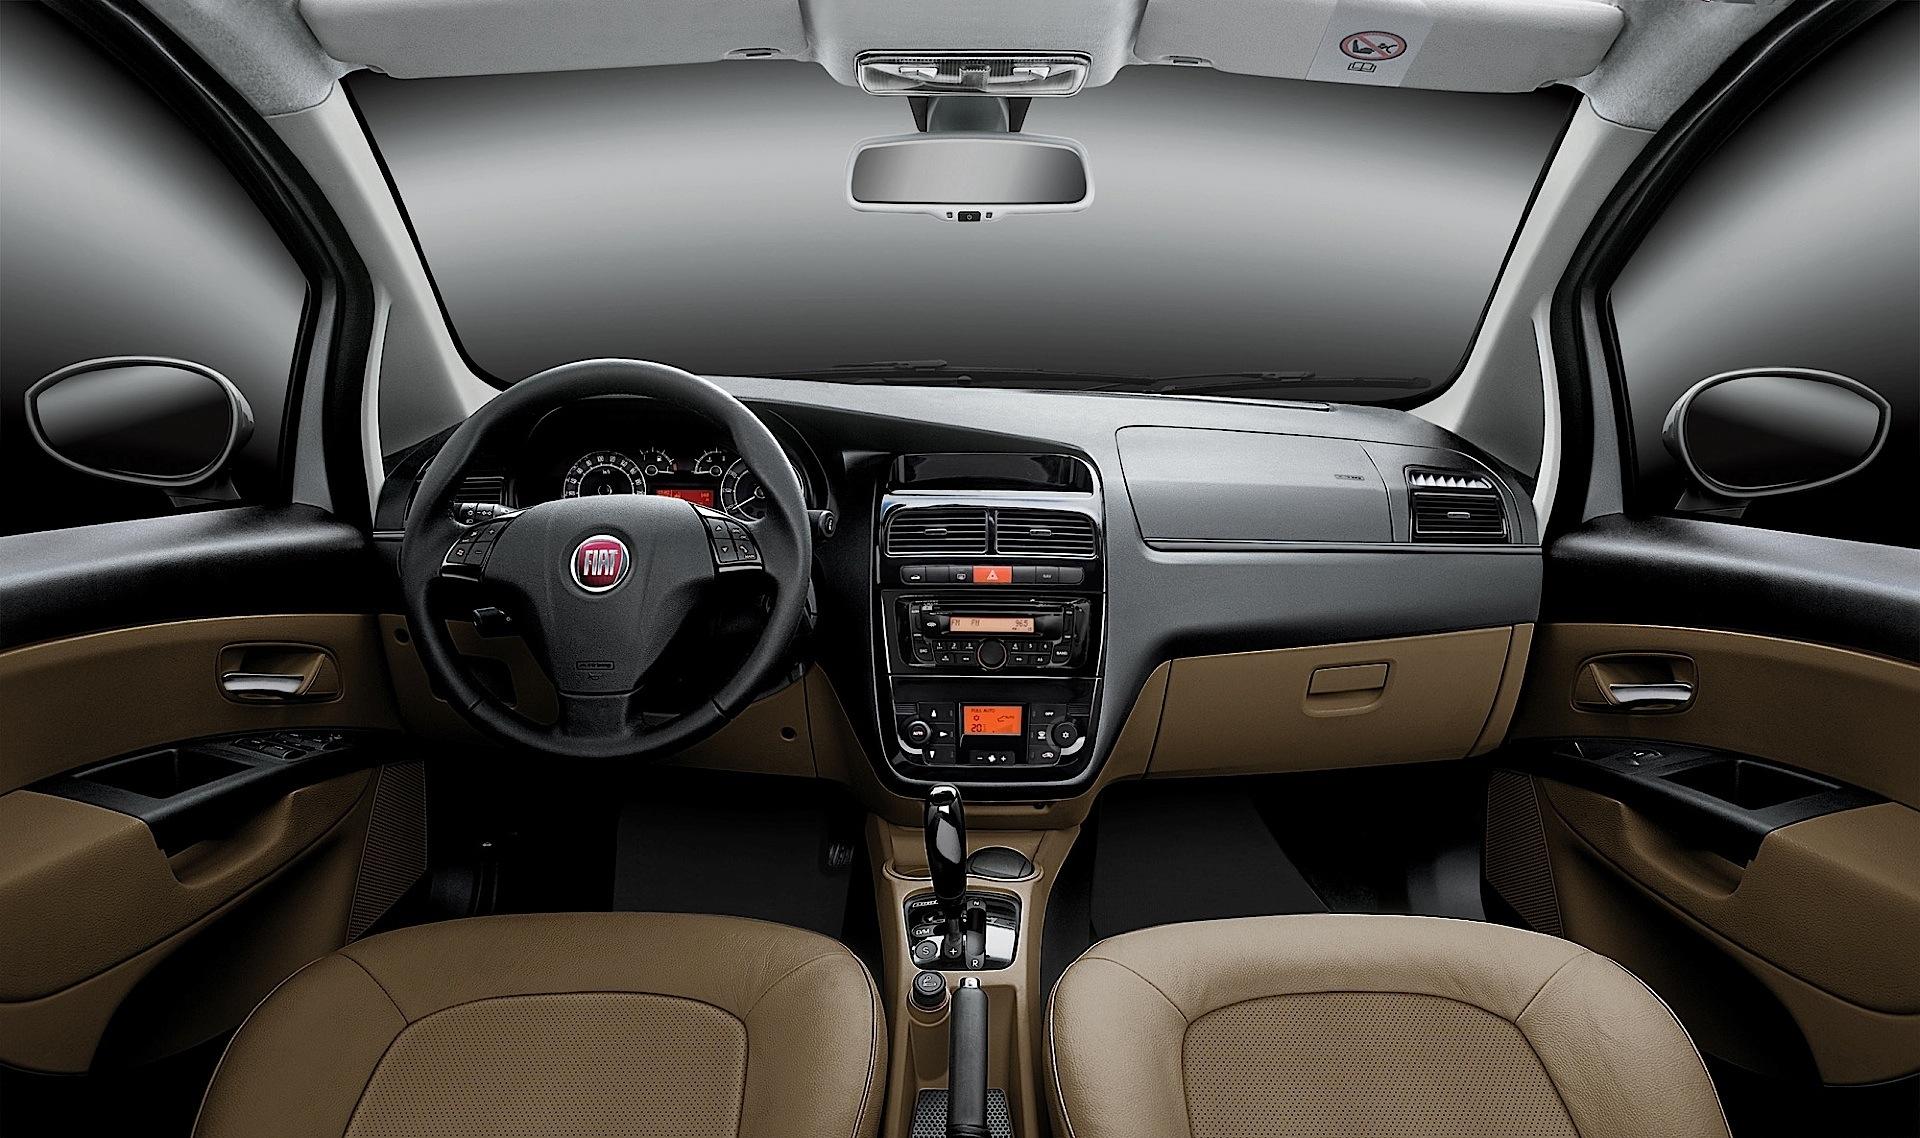 Fiat Linea Specs 2006 2007 2008 2009 2010 2011